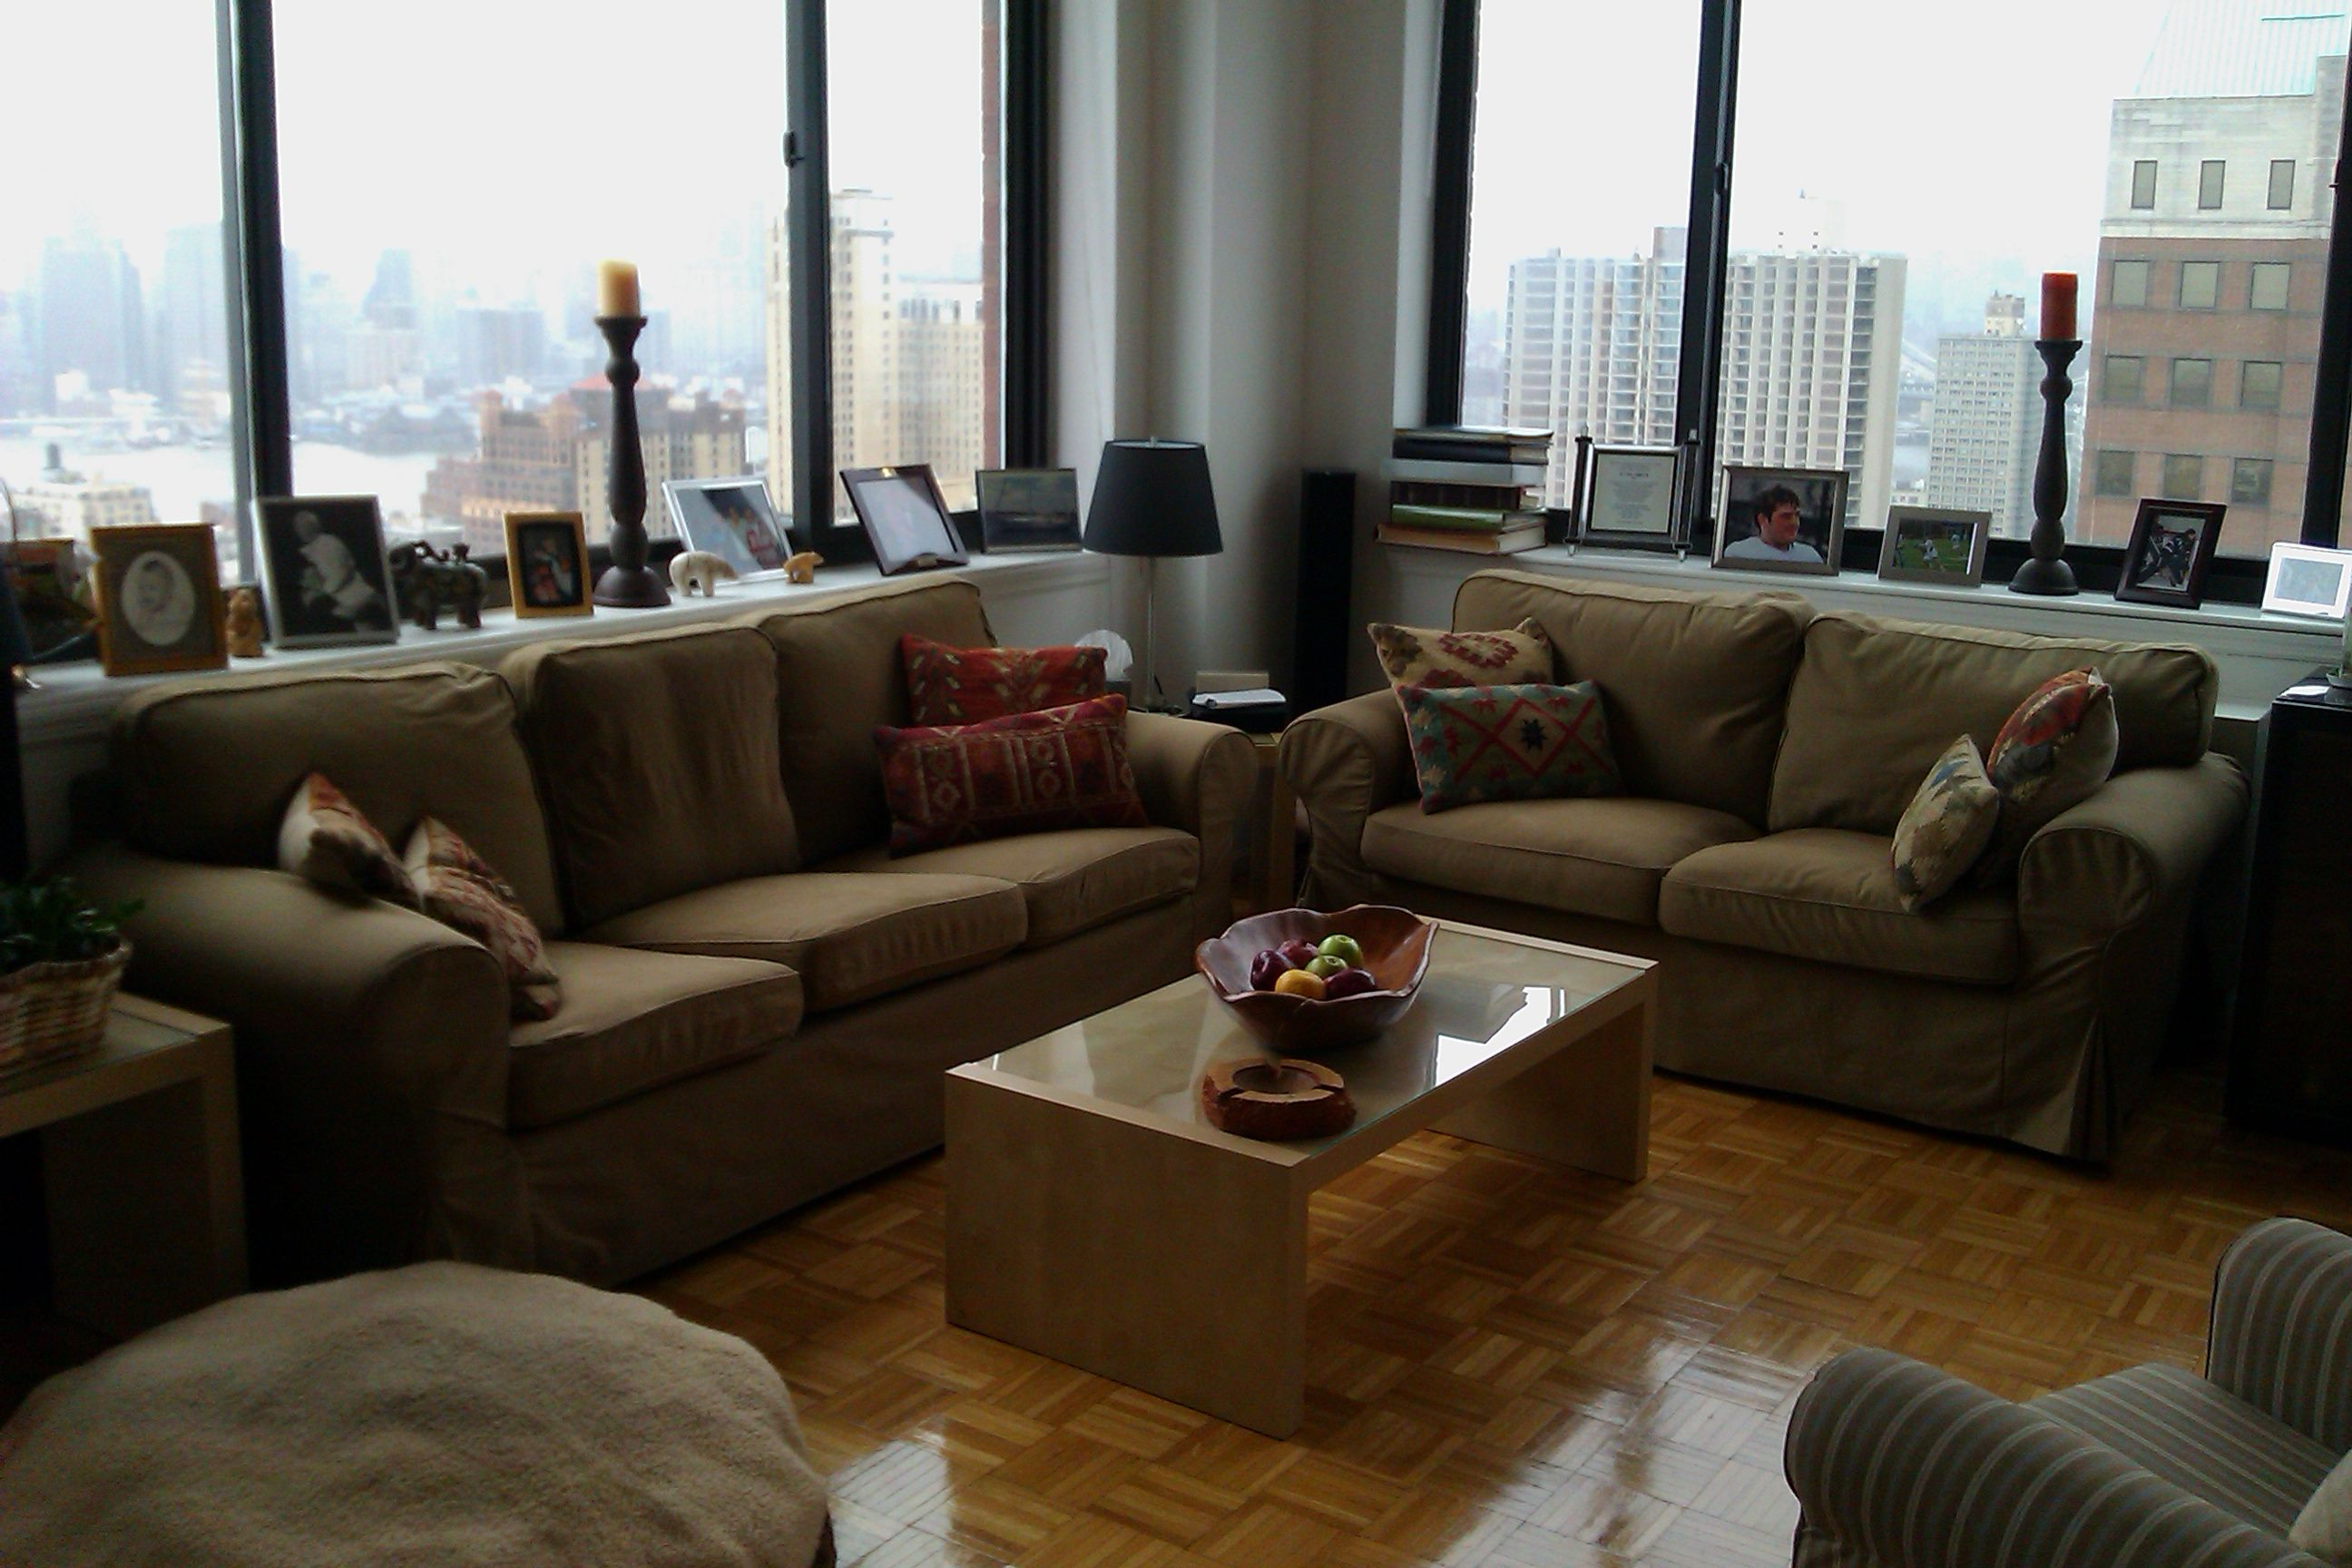 Ikea Living Room Design with Set Sfa Soft of Fabric ...